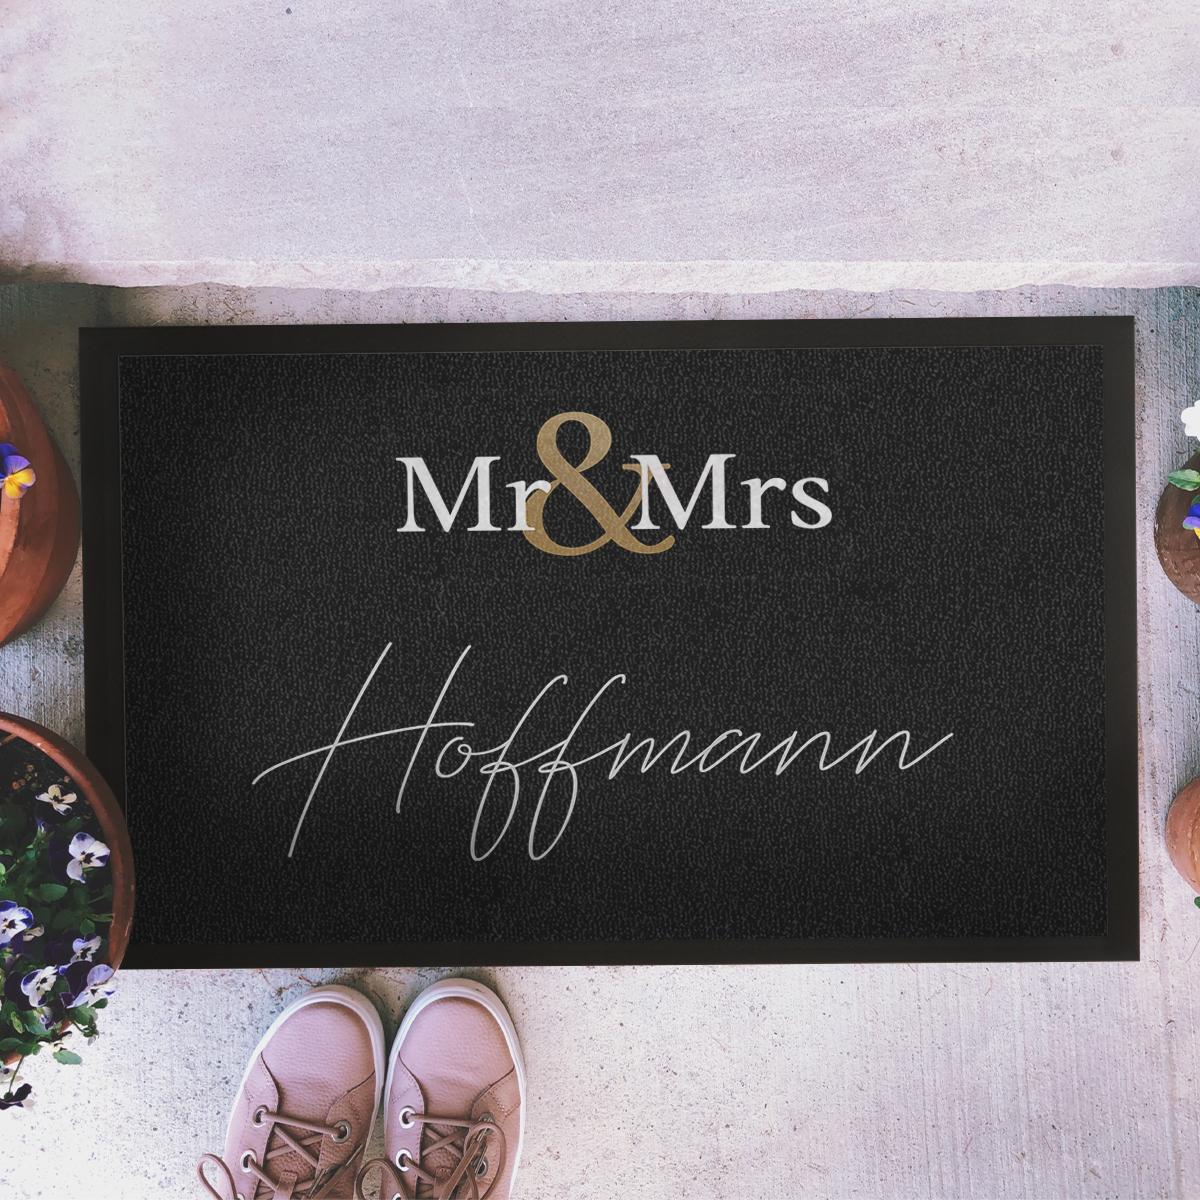 LEOLY   FUSSMATTE   MR AND MRS II